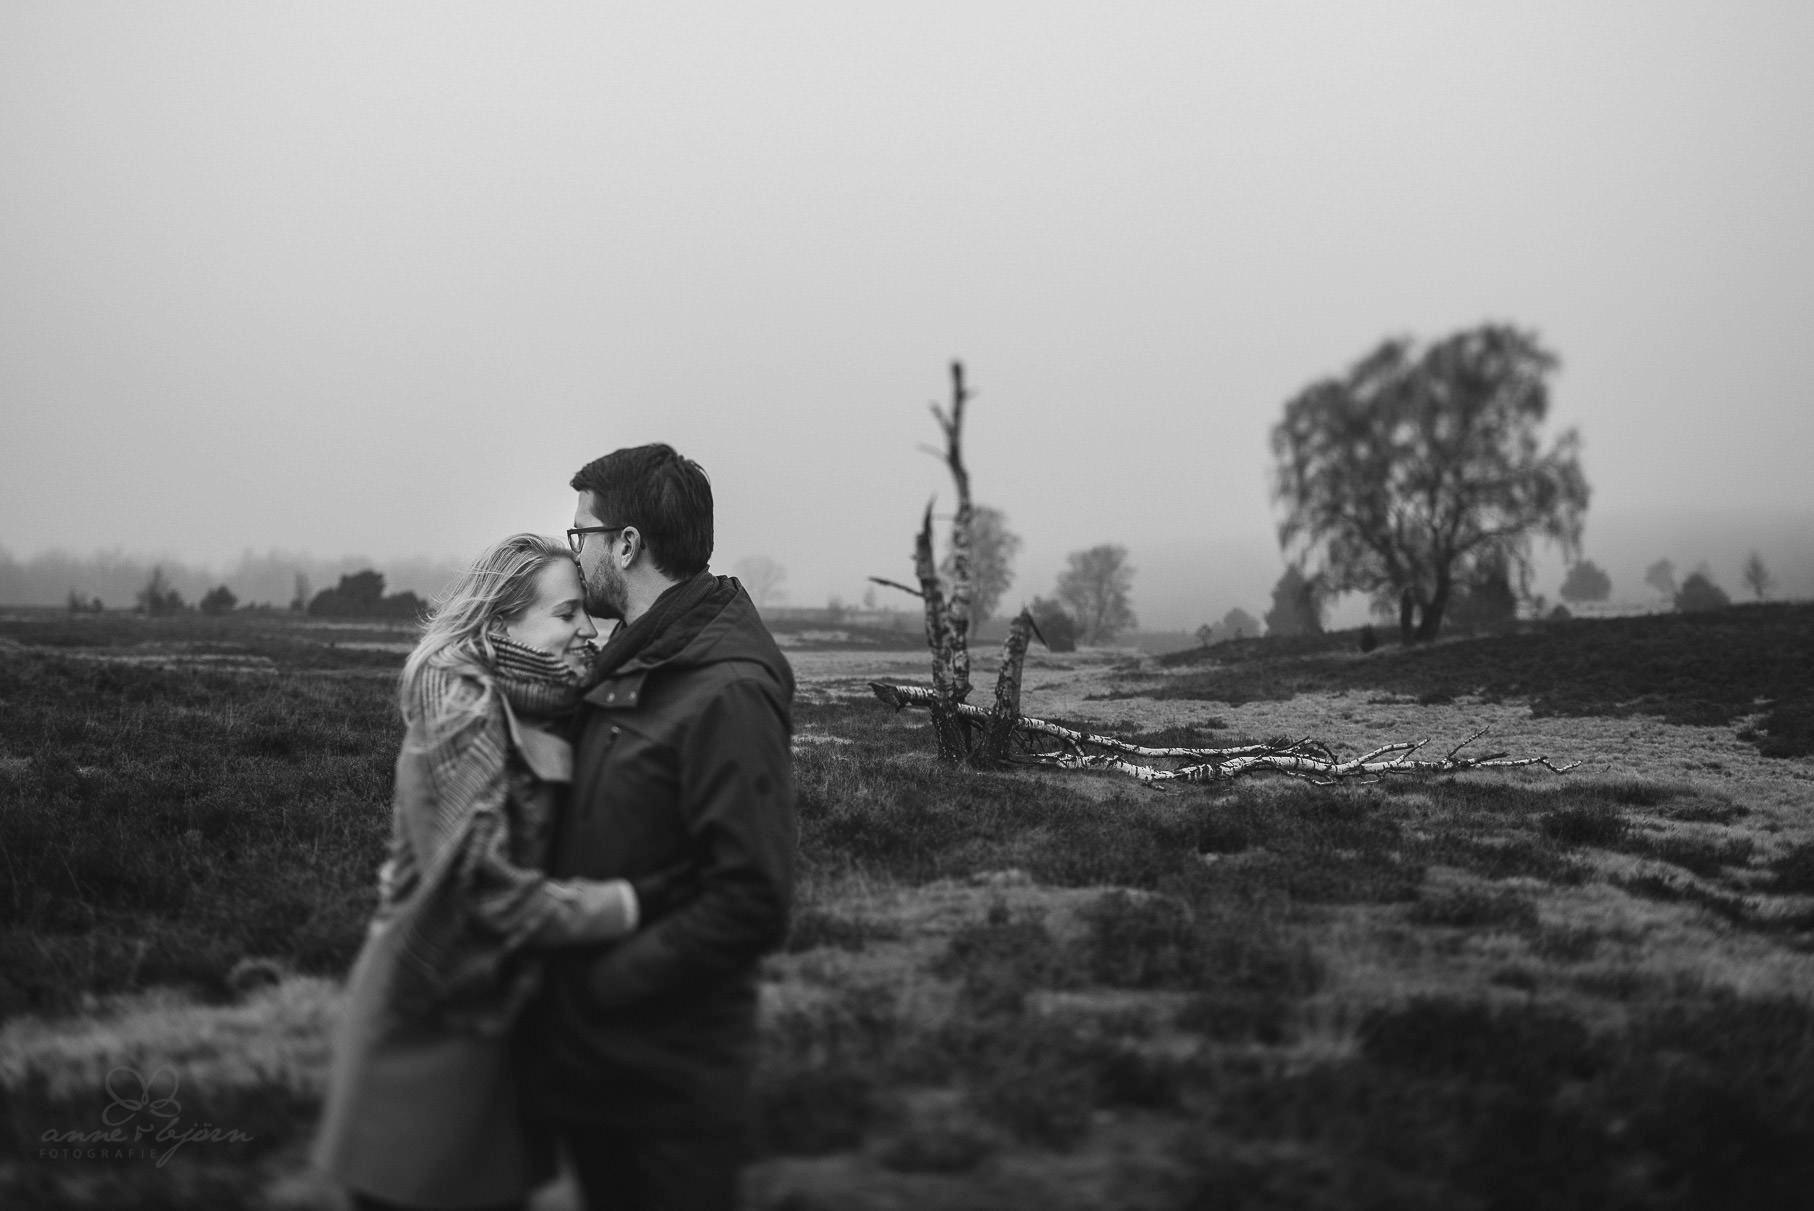 Verlobungsshooting in der Lneburger Heide  Sabrina